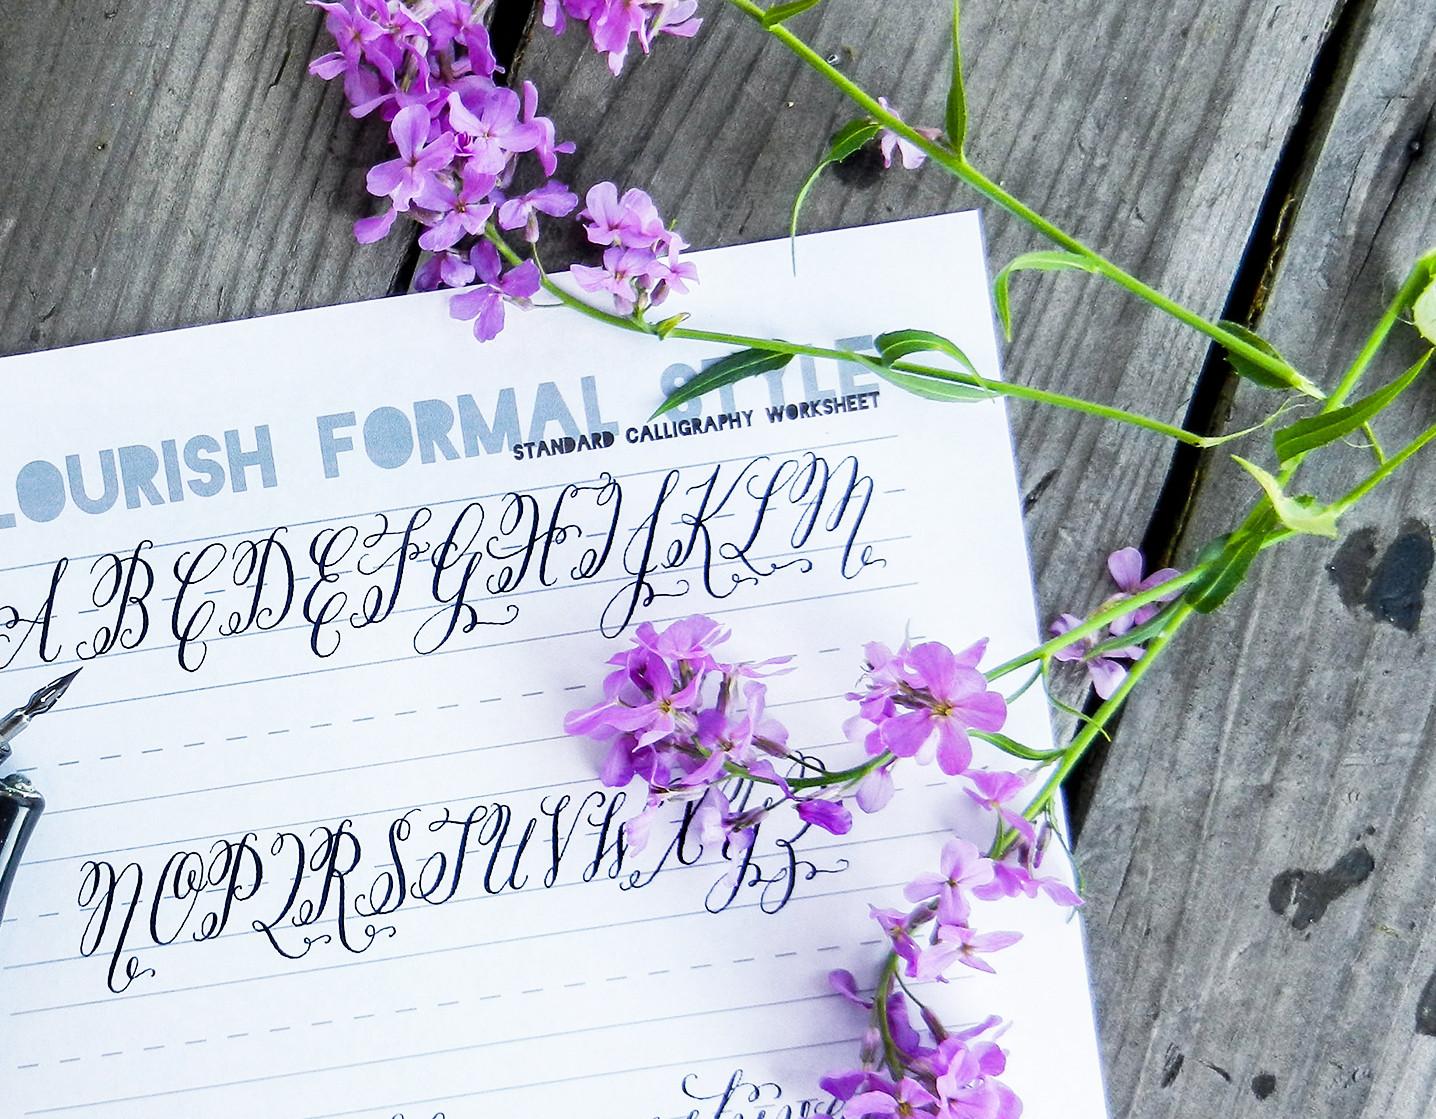 Flourish Formal Style Calligraphy Worksheet   The Postman's Knock